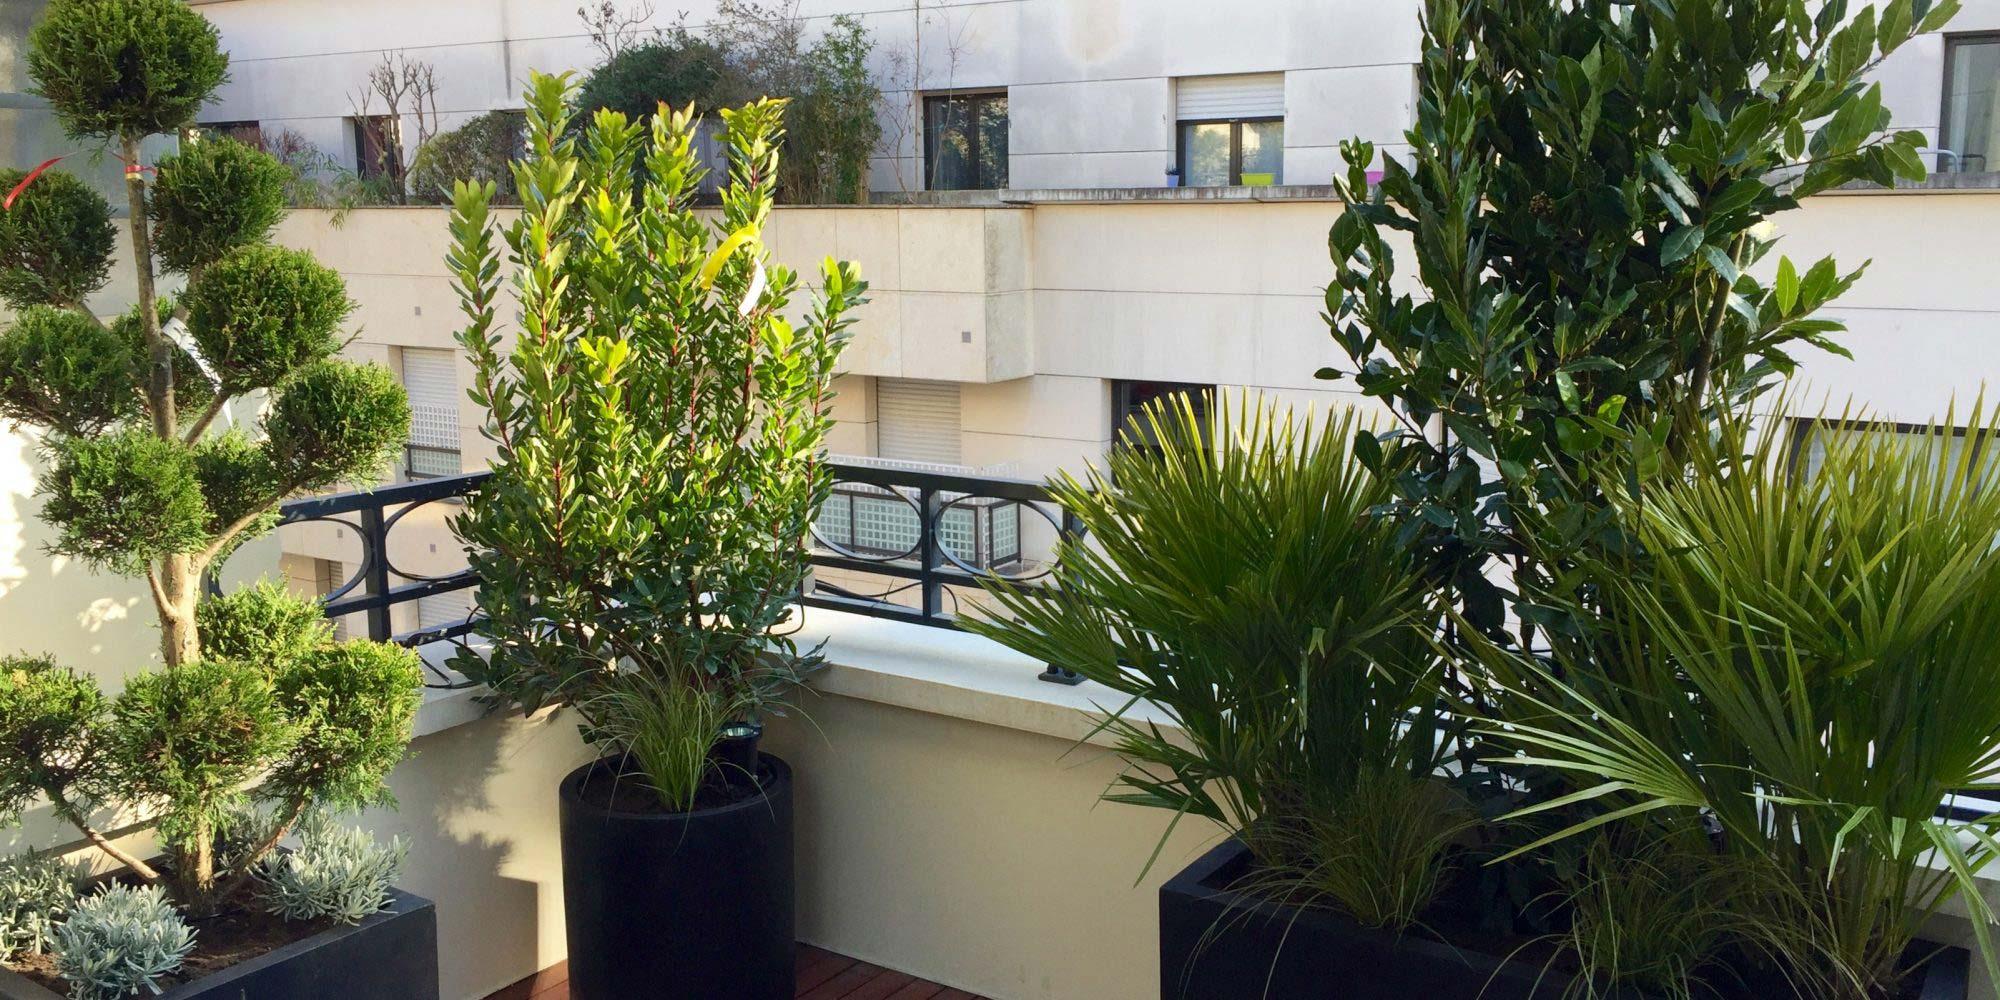 Nos réalisations : des balcons urban green